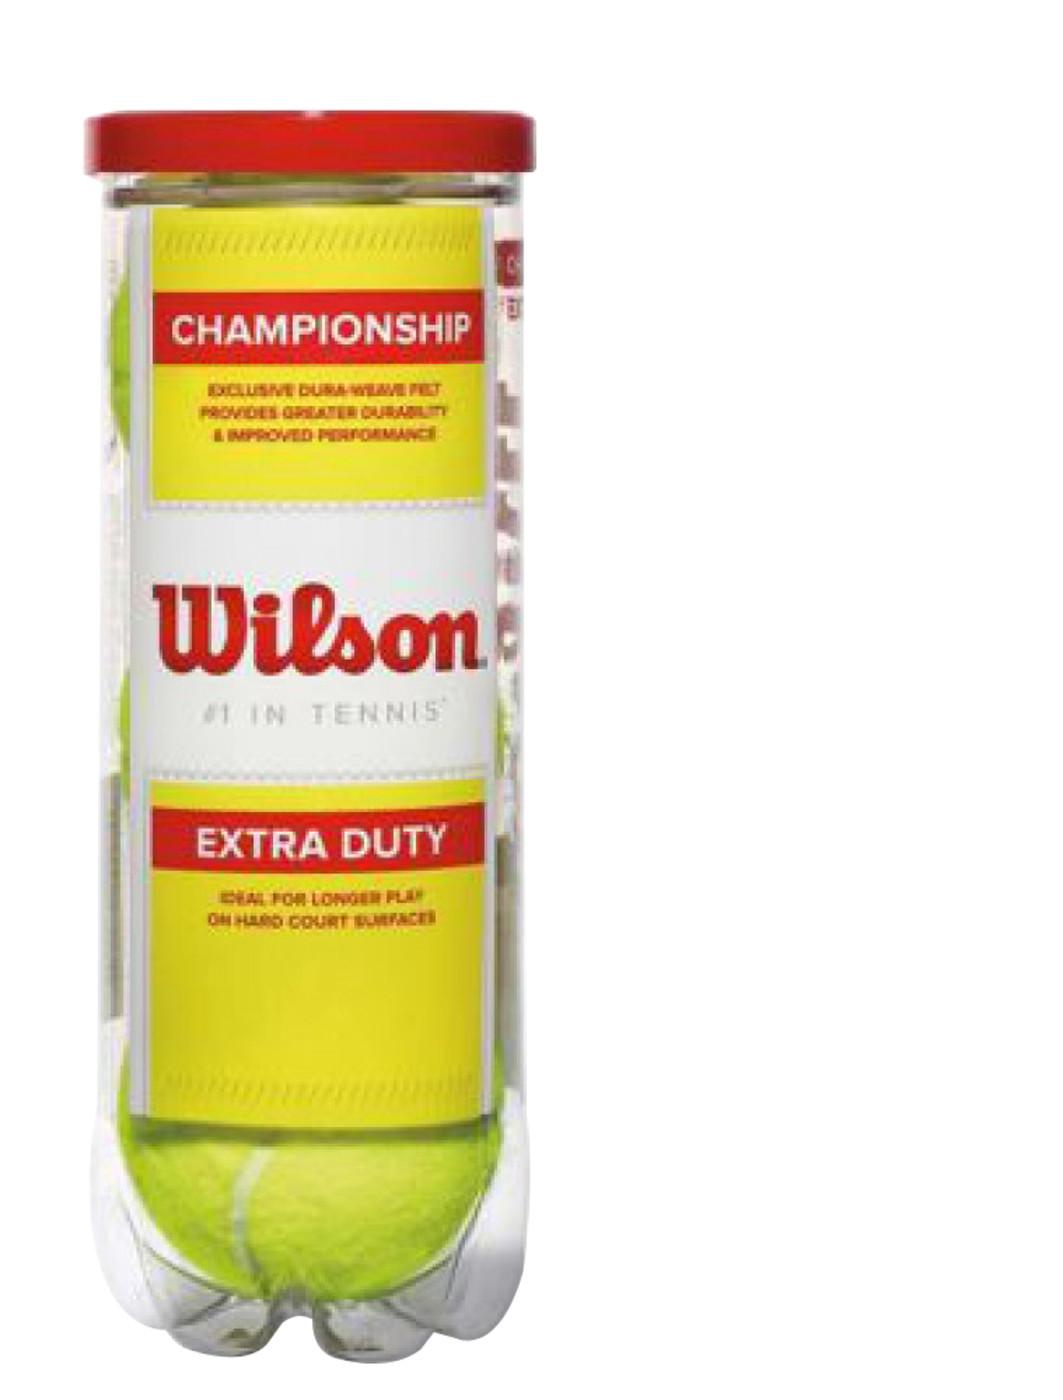 WILSON Champinship